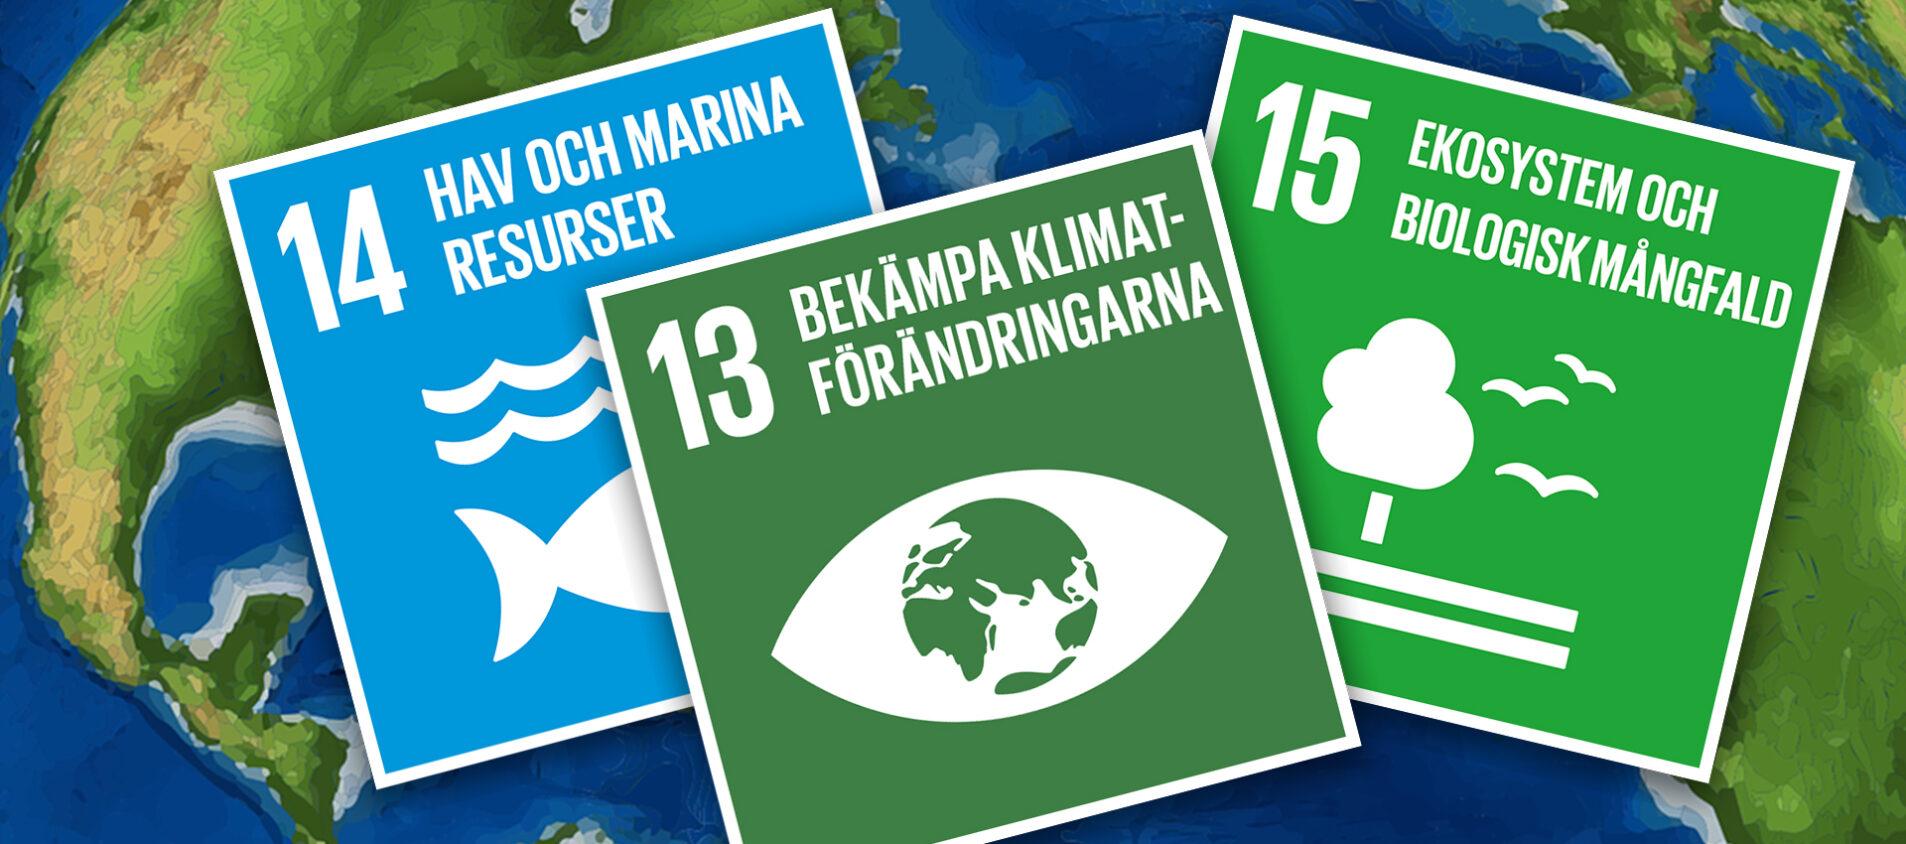 Globala målen tar han om jordklotet